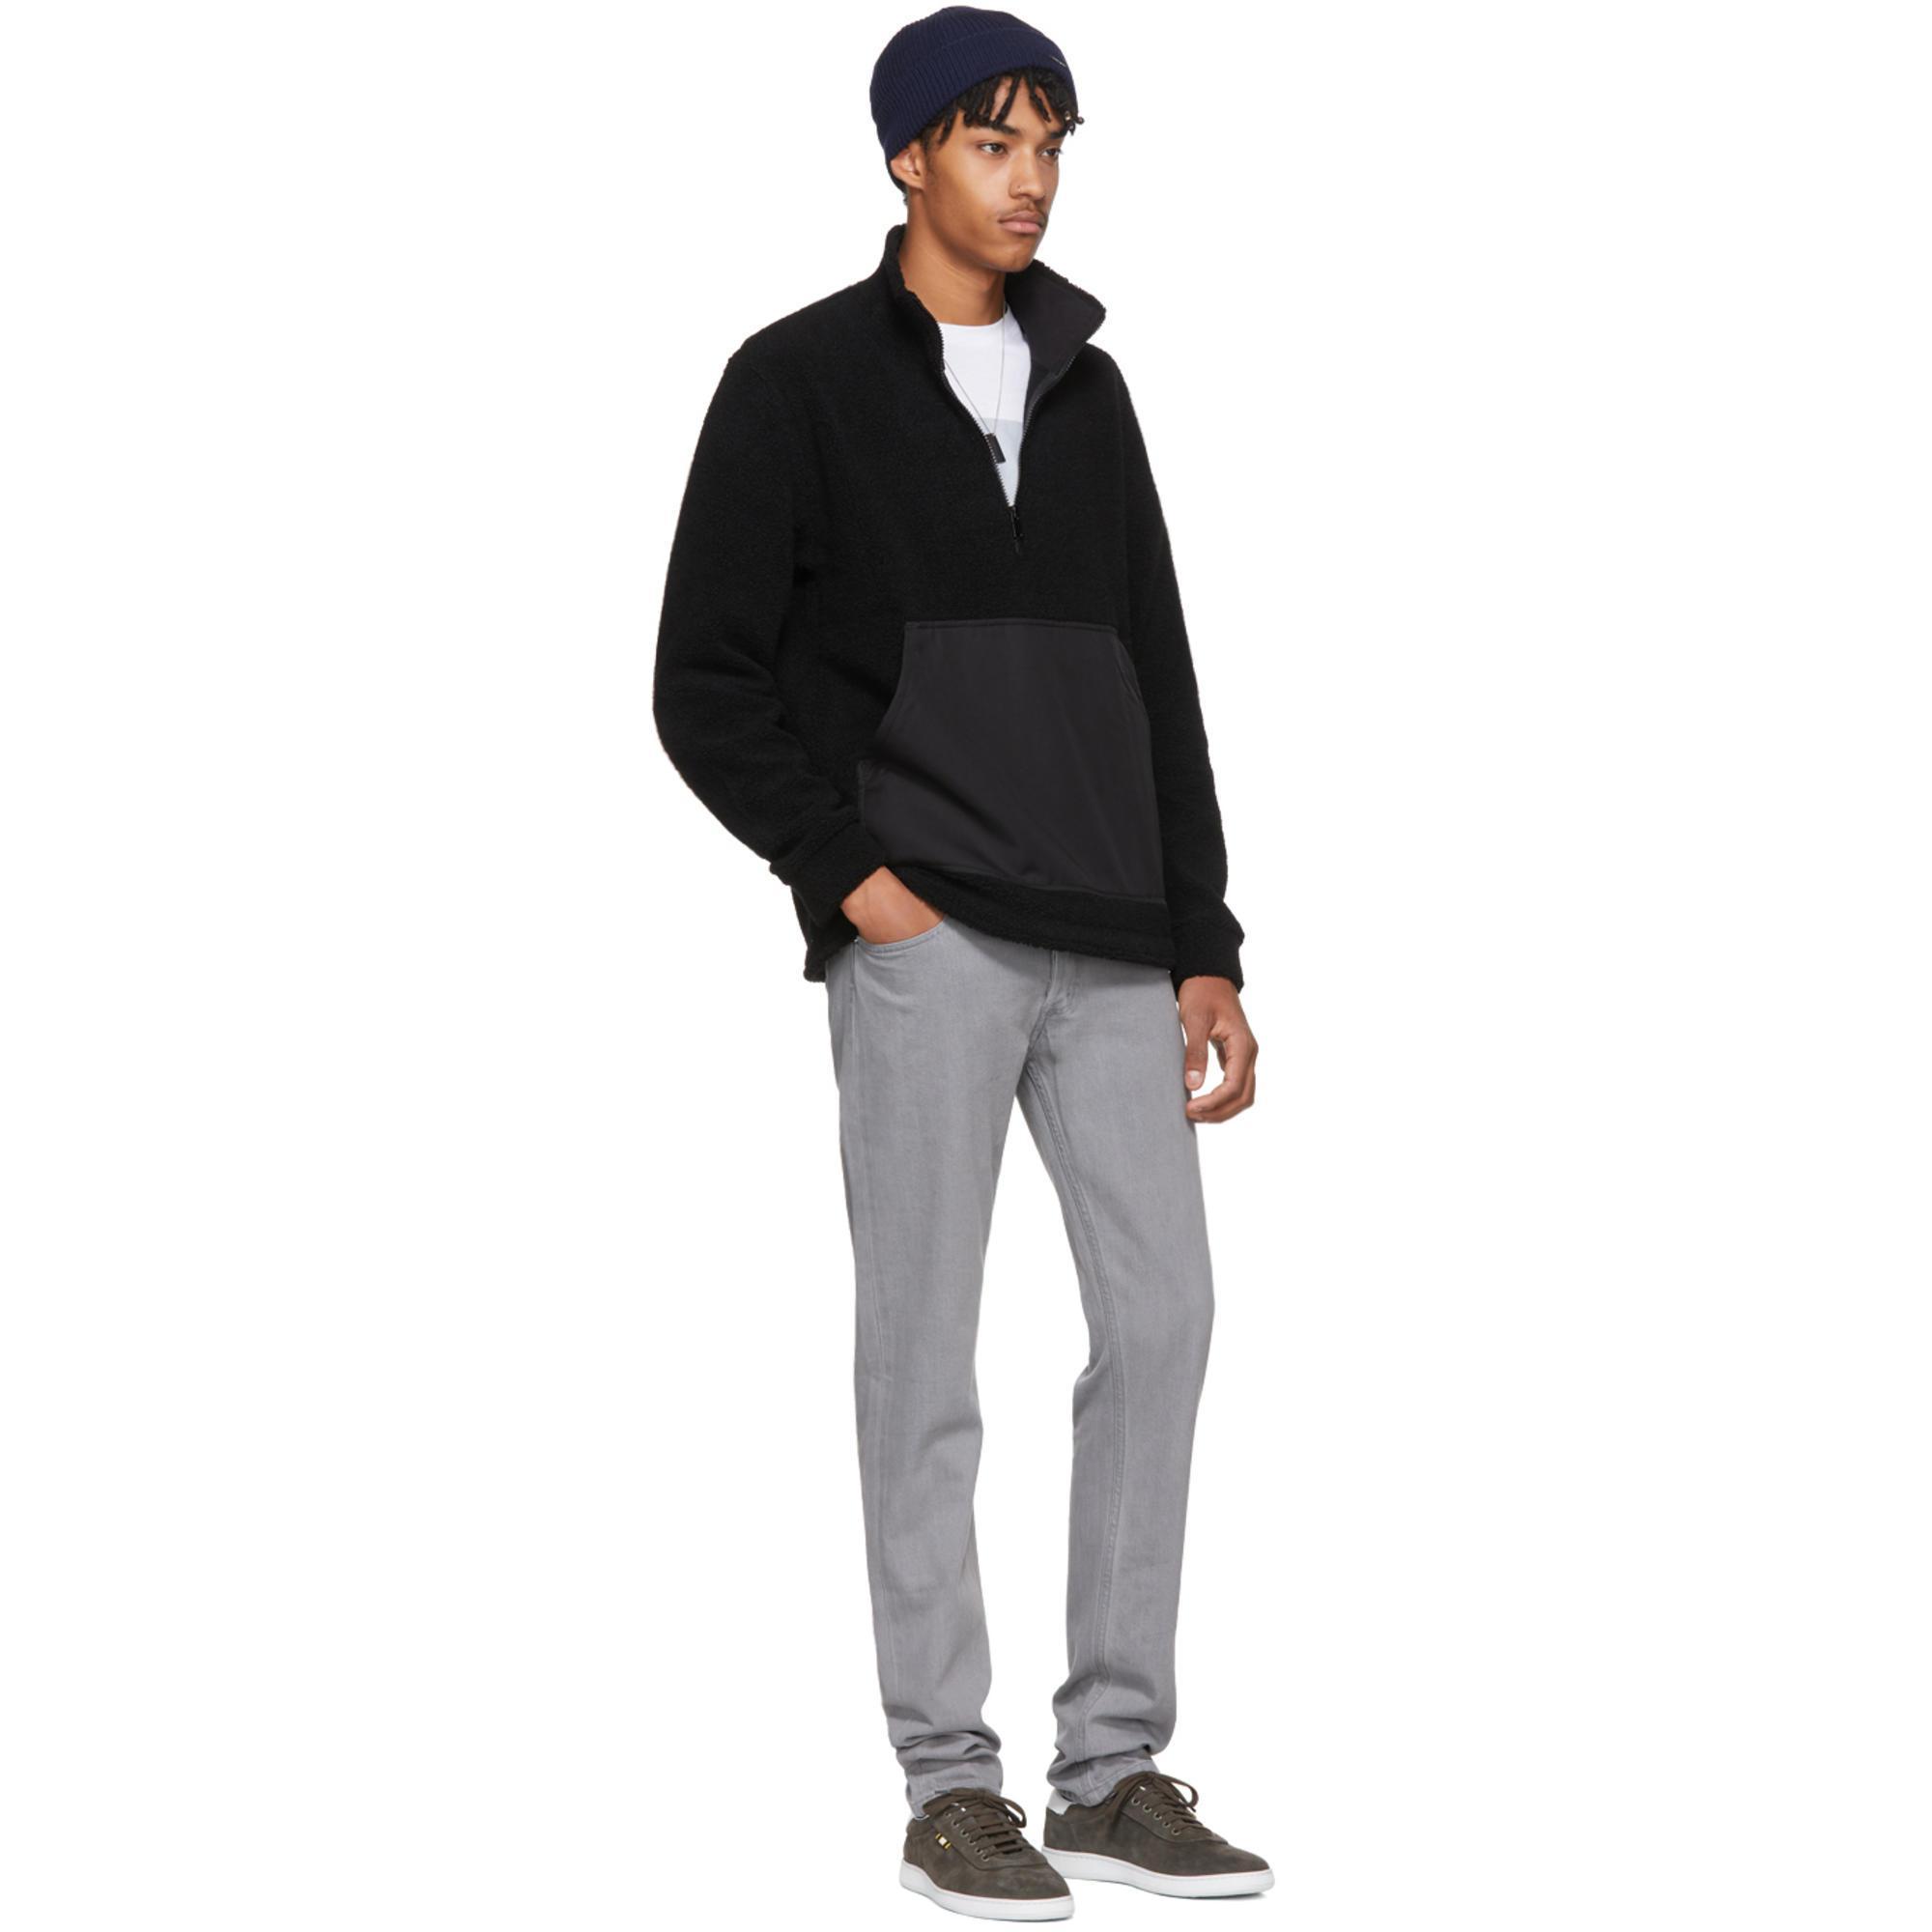 A.P.C. Wool Black Summit Jacket for Men